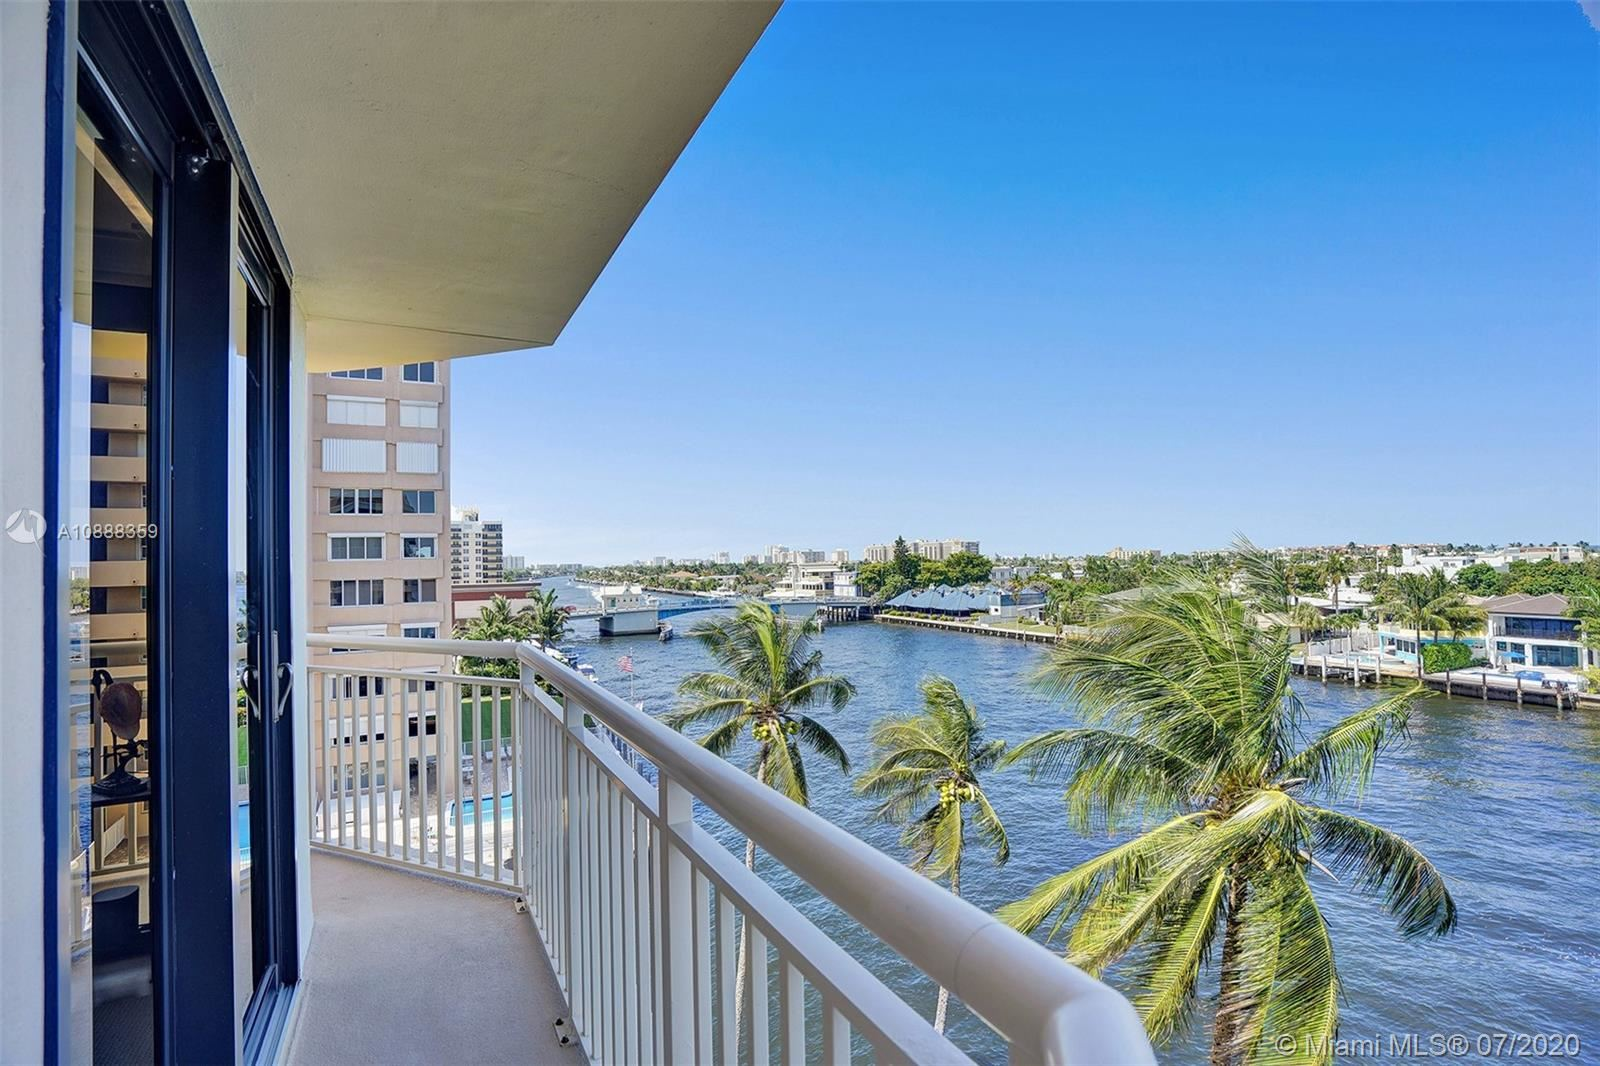 Photo of 3100 NE 48th St #512, Fort Lauderdale, FL 33308 (MLS # A10888359)